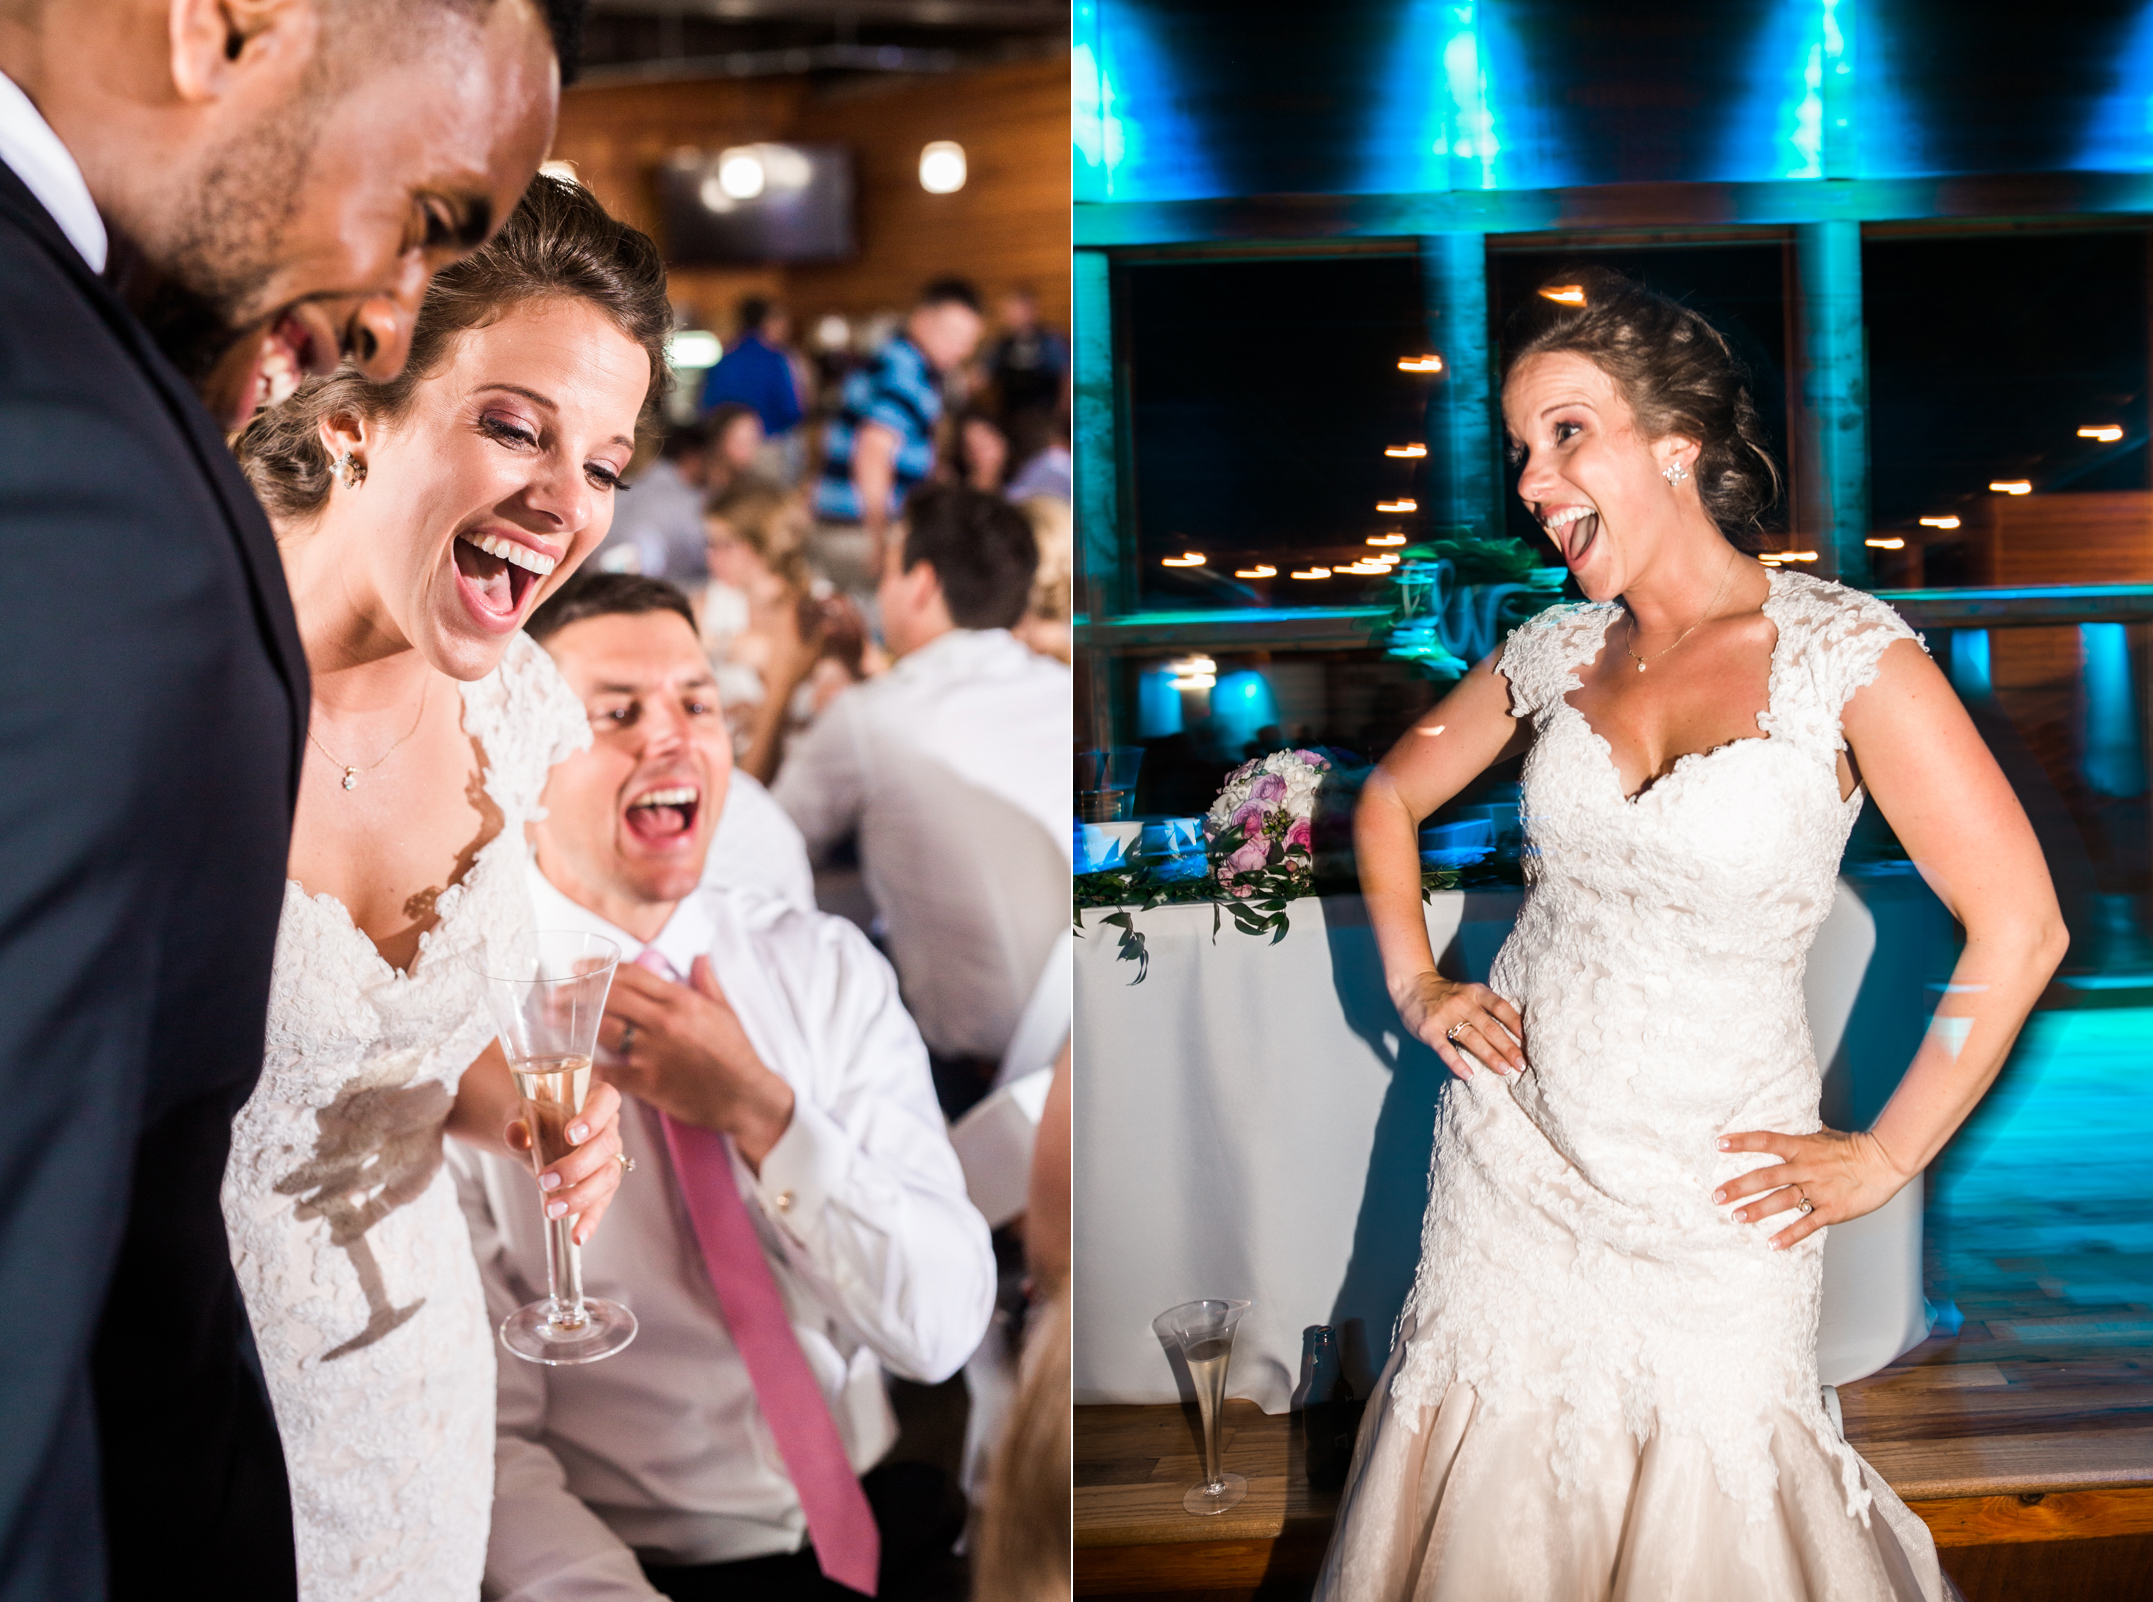 LegacyUnion-Wedding-Photographer-Glendale-CA-168 copy.jpg